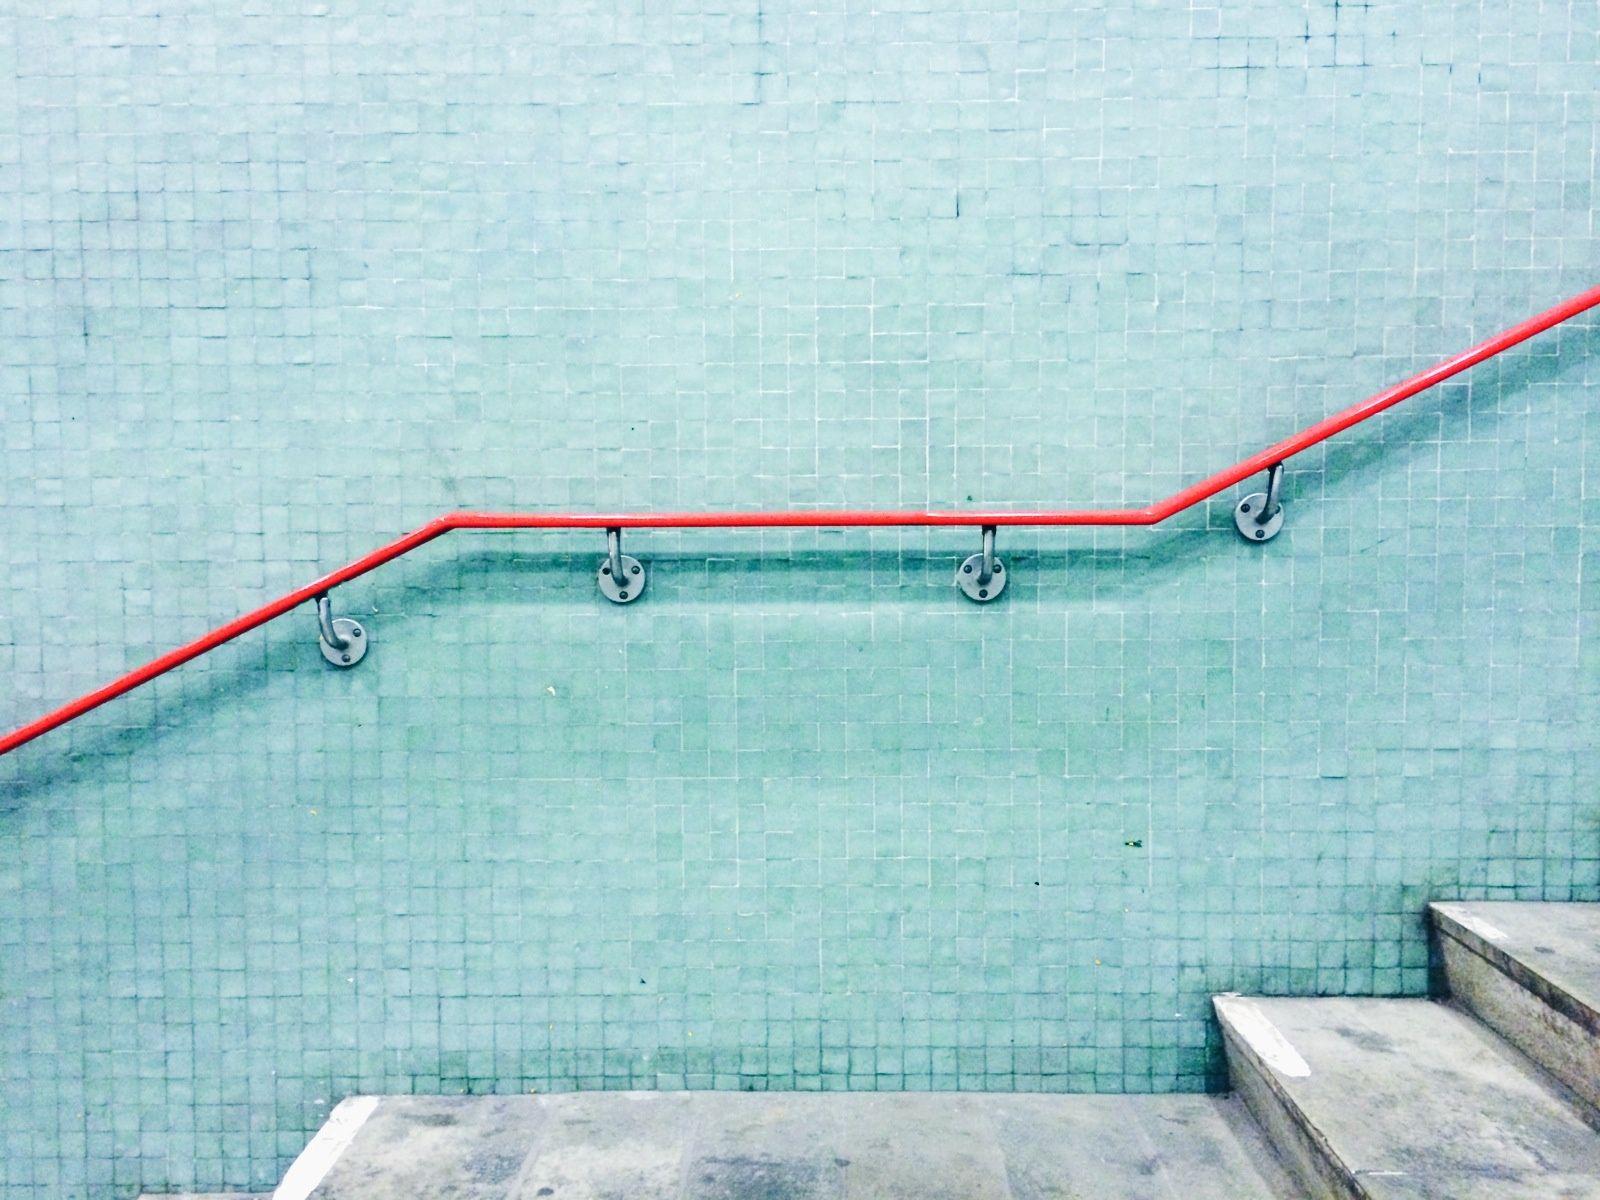 sydhavn | Mathias Eis Schultz | VSCO Grid